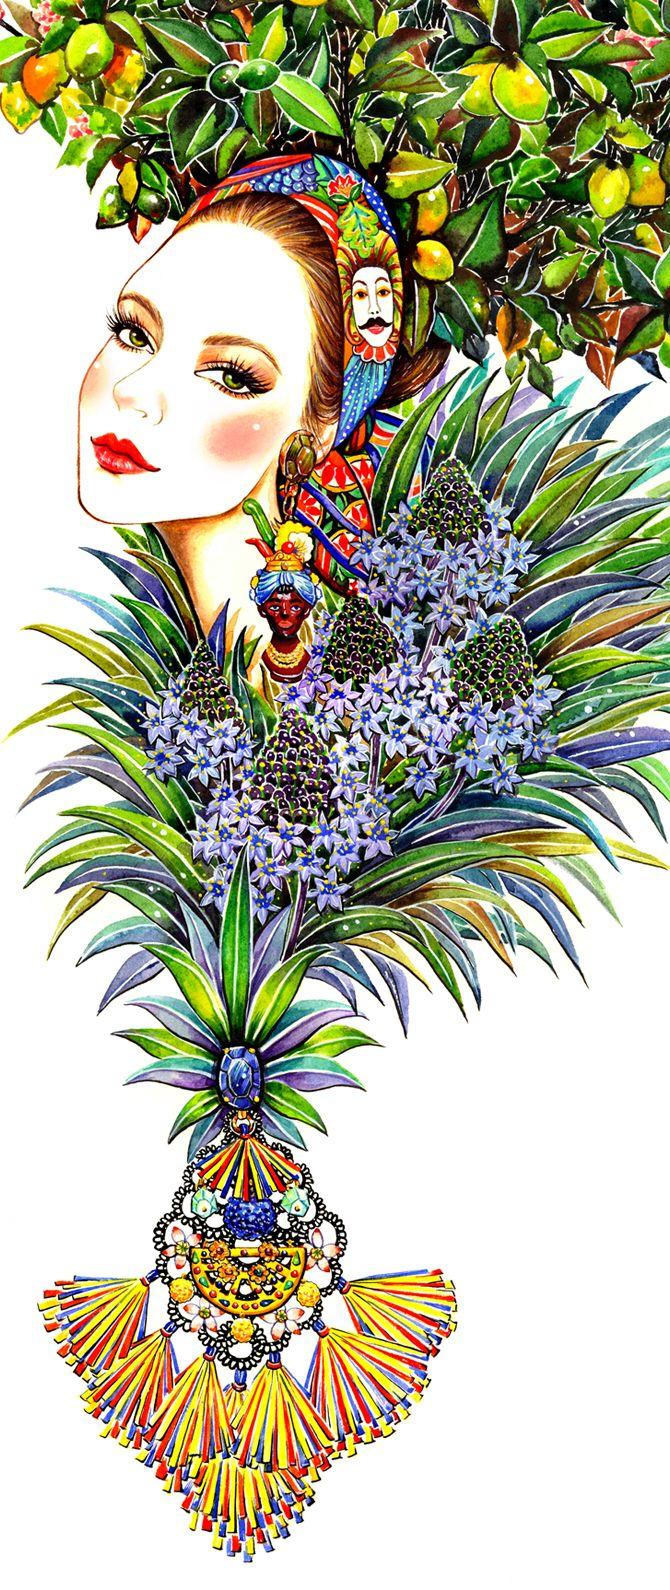 Garden - illustration by Sunny Gu   House of Beccaria~